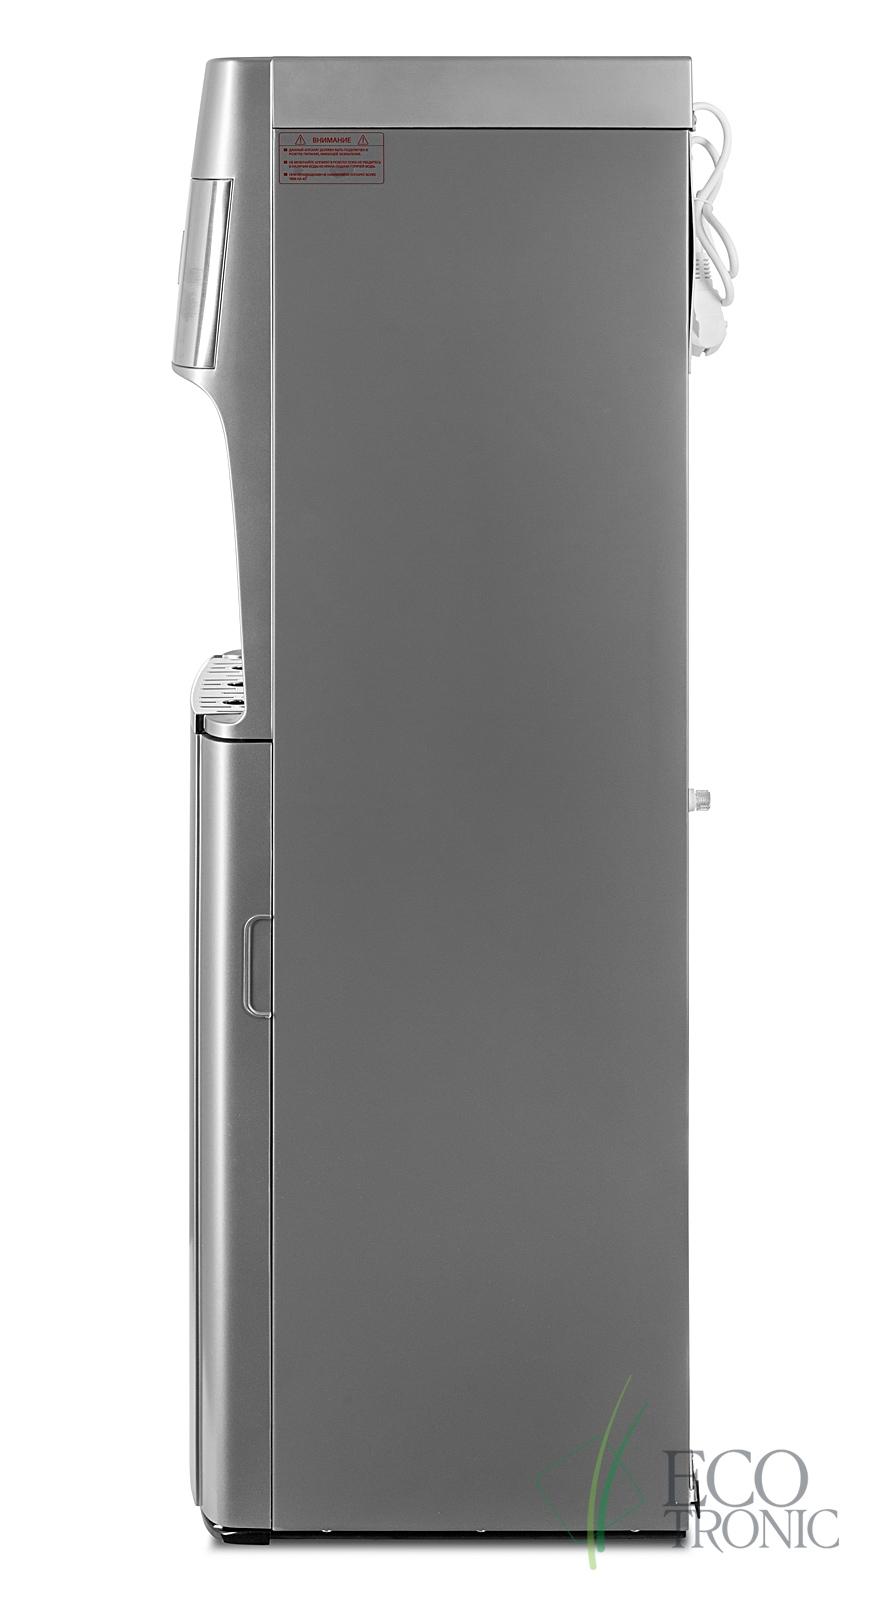 Кулер с нижней загрузкой бутыли Ecotronic M30-LXE silver+SS - 9